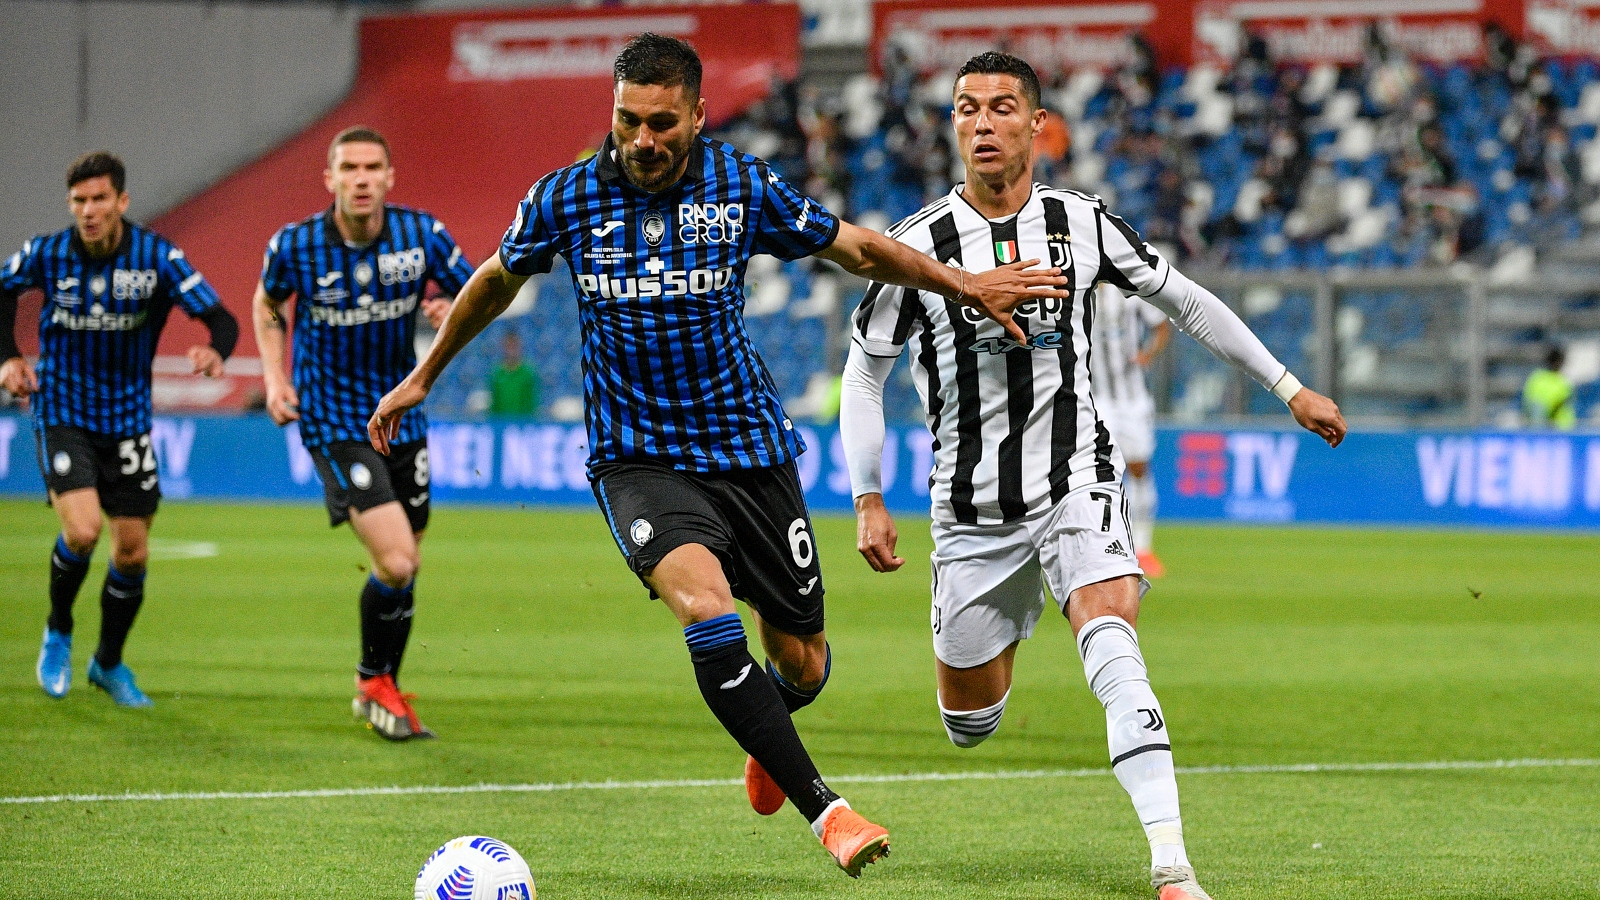 Atalanta - Juventus 1-2 - Calcio - Rai Sport